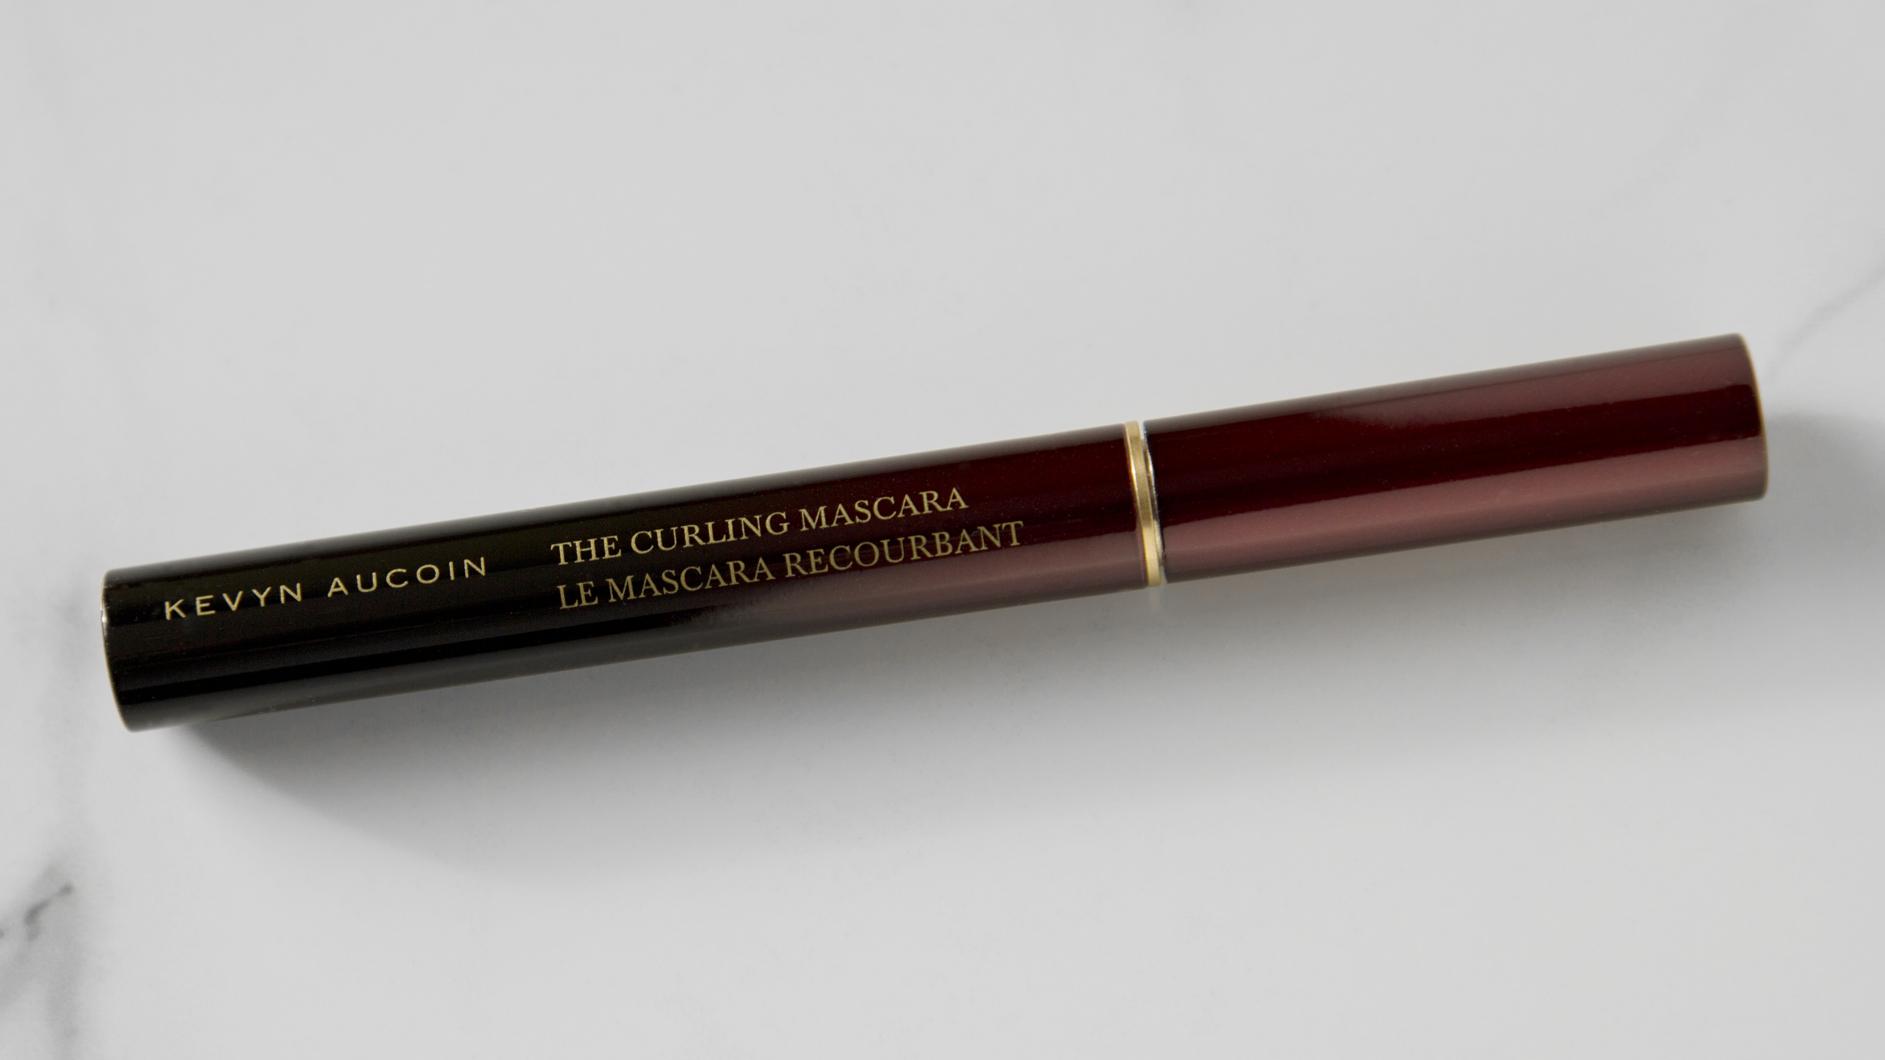 Kevyn Aucoin The Curling Mascara $28